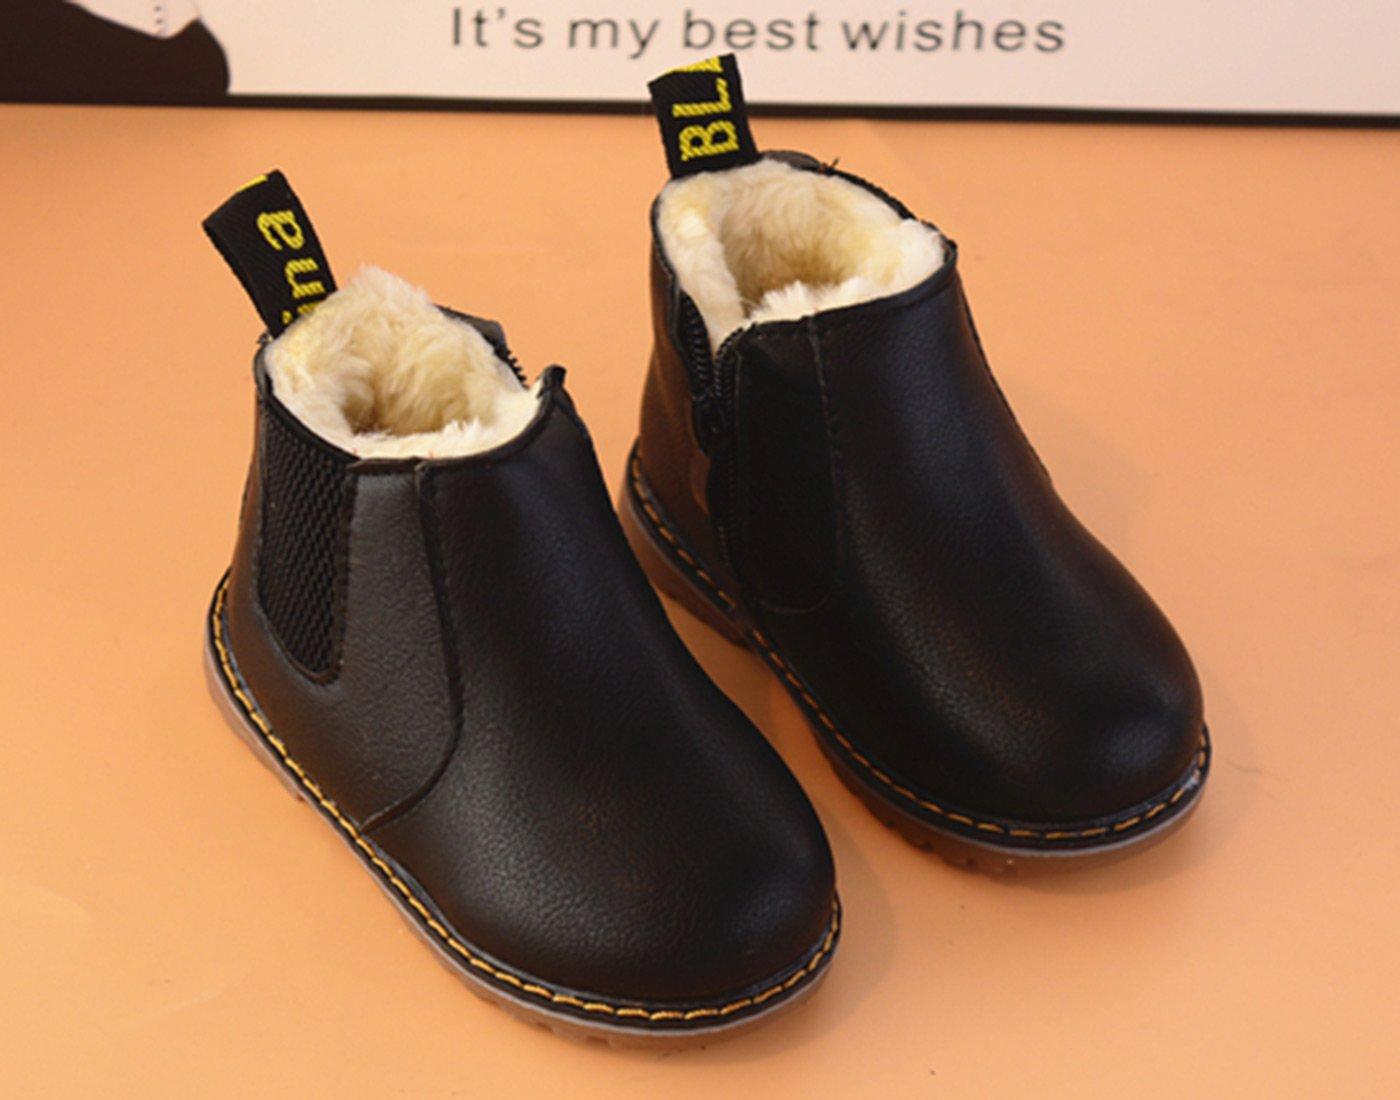 Boys Girls Cute Design Boot Anti Slip PU Leather Ankle Biker Boots Short Martin Booties Low Heels Black Size 6 M